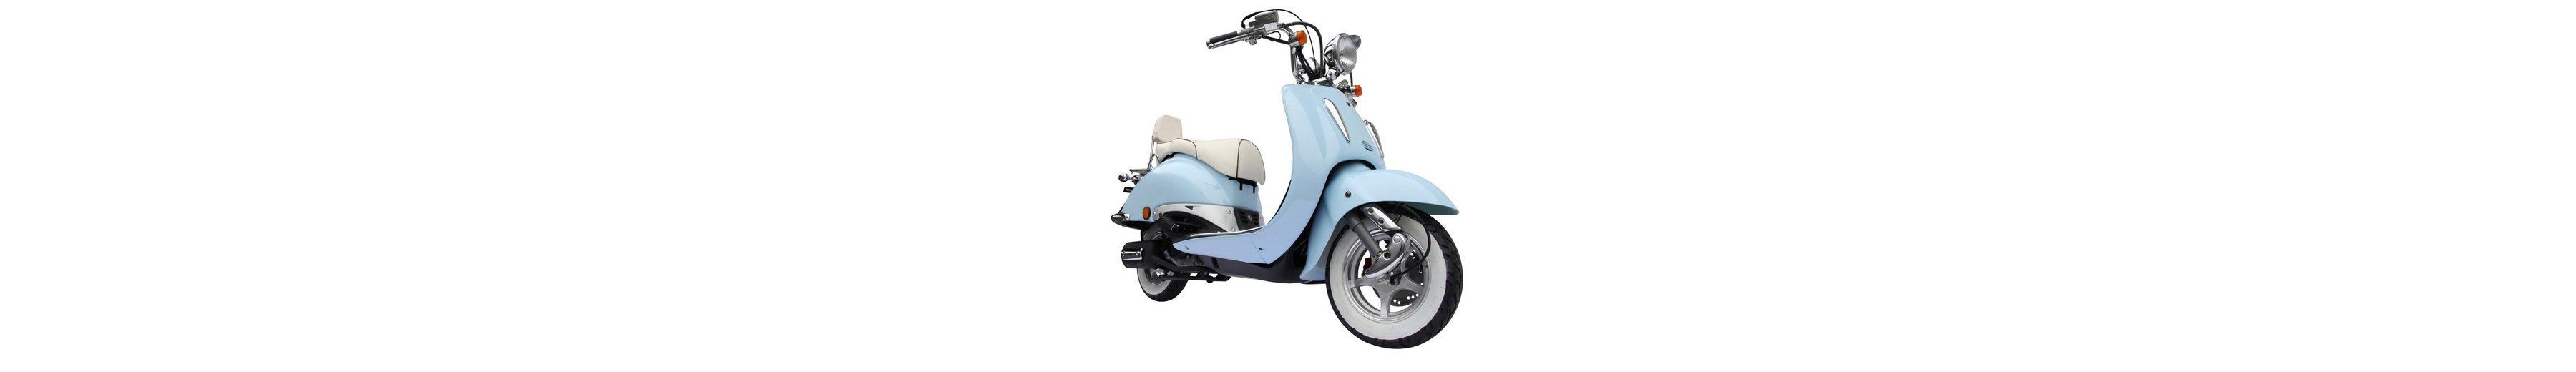 Motorroller »Strada«, 50 ccm, 45 km/h